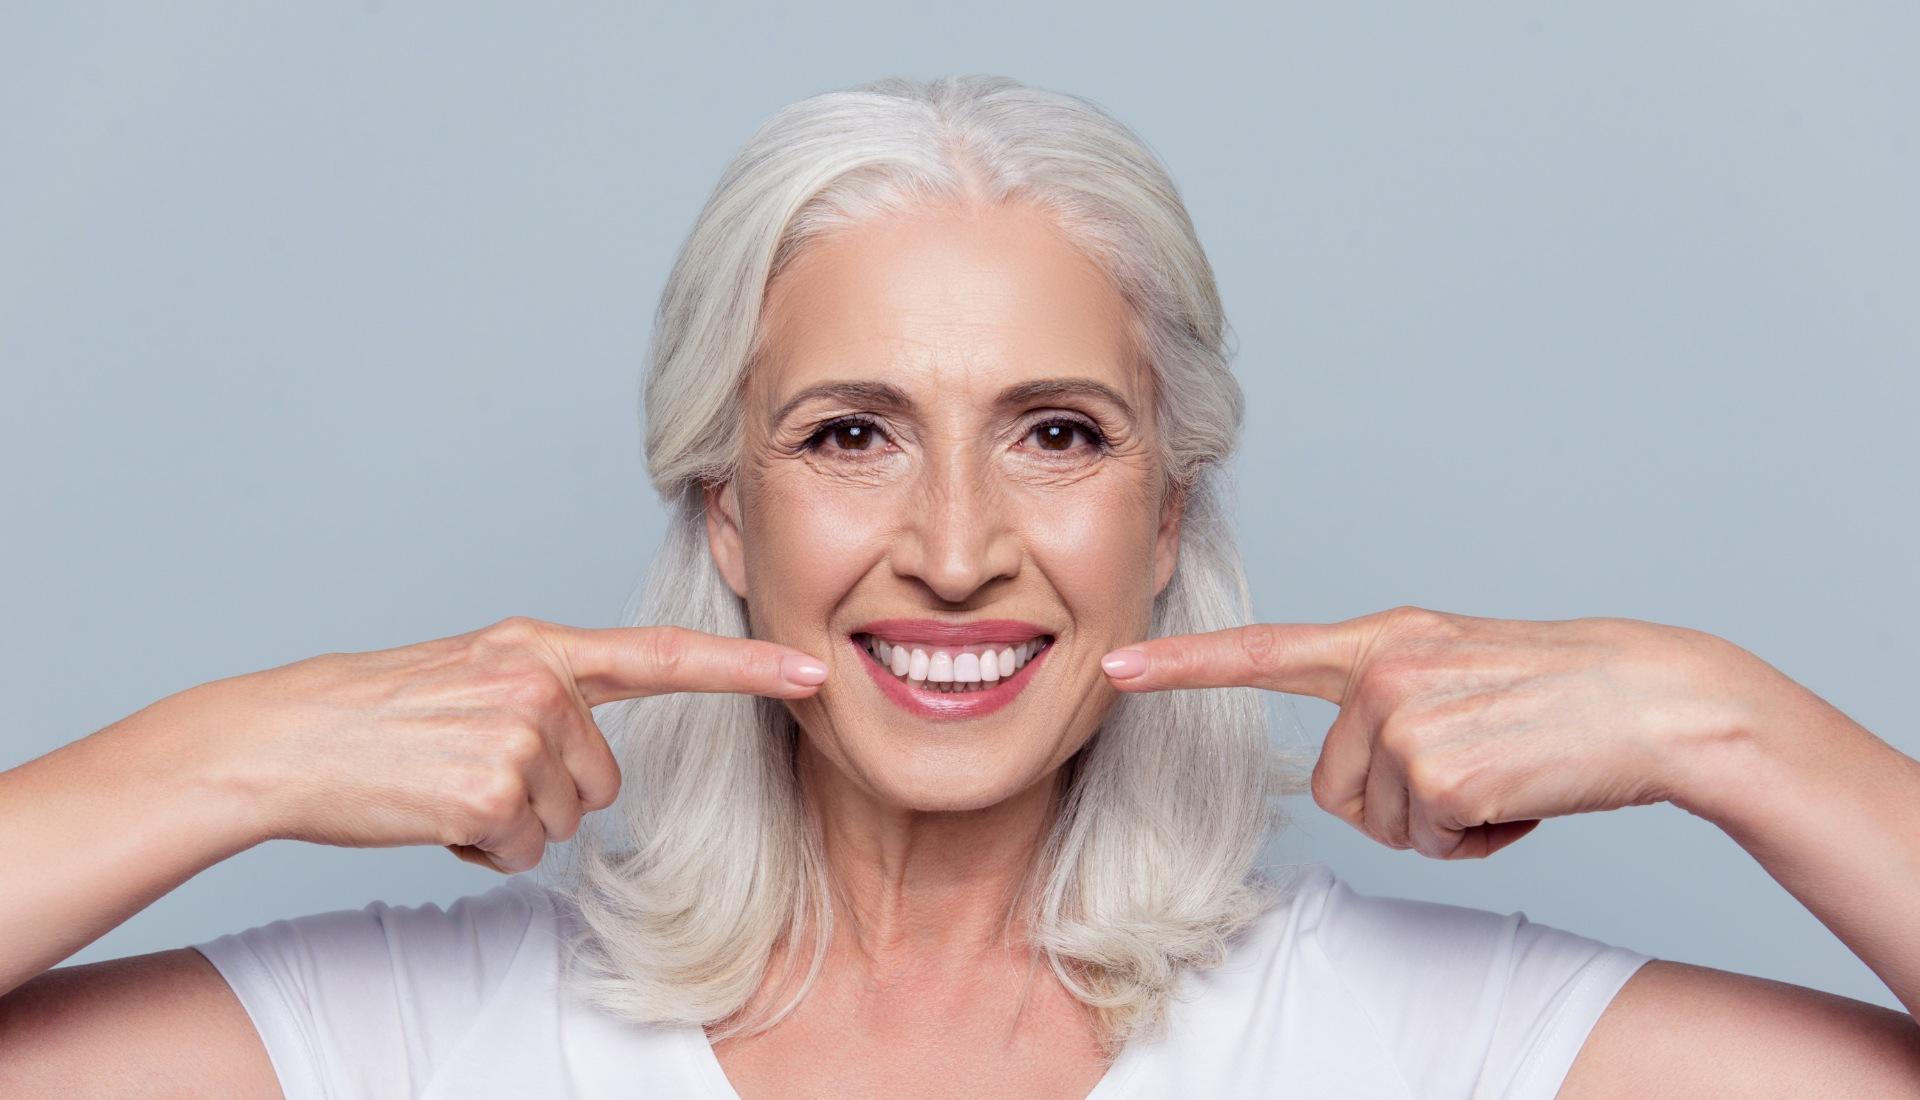 Protesis Dentales Marfil Den